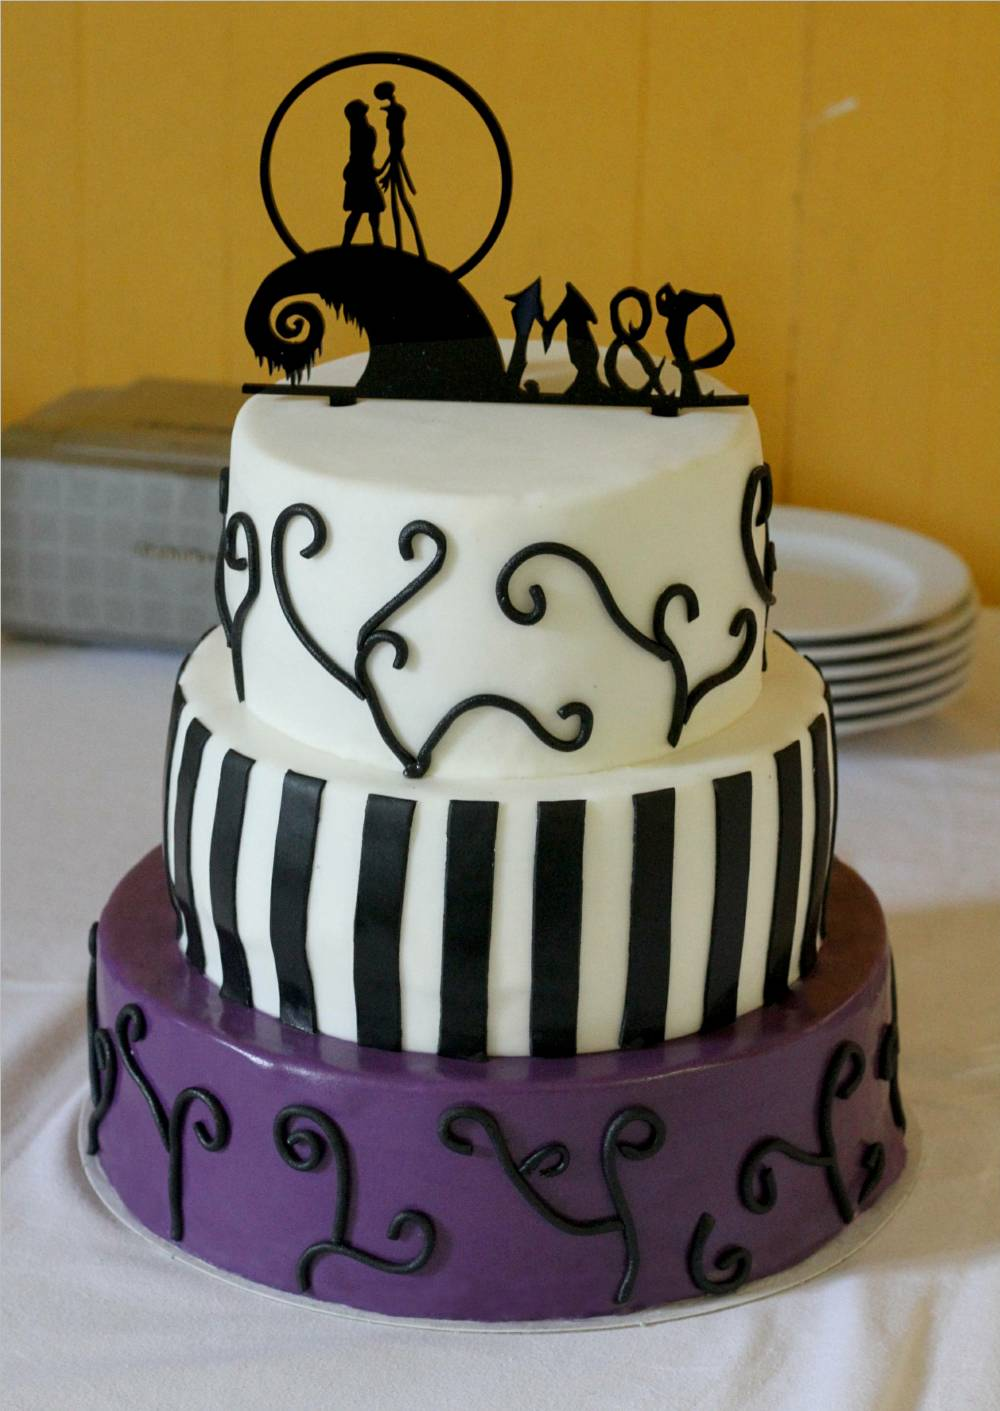 The Nightmare Before Christmas cake topper acrylic wedding cake ...